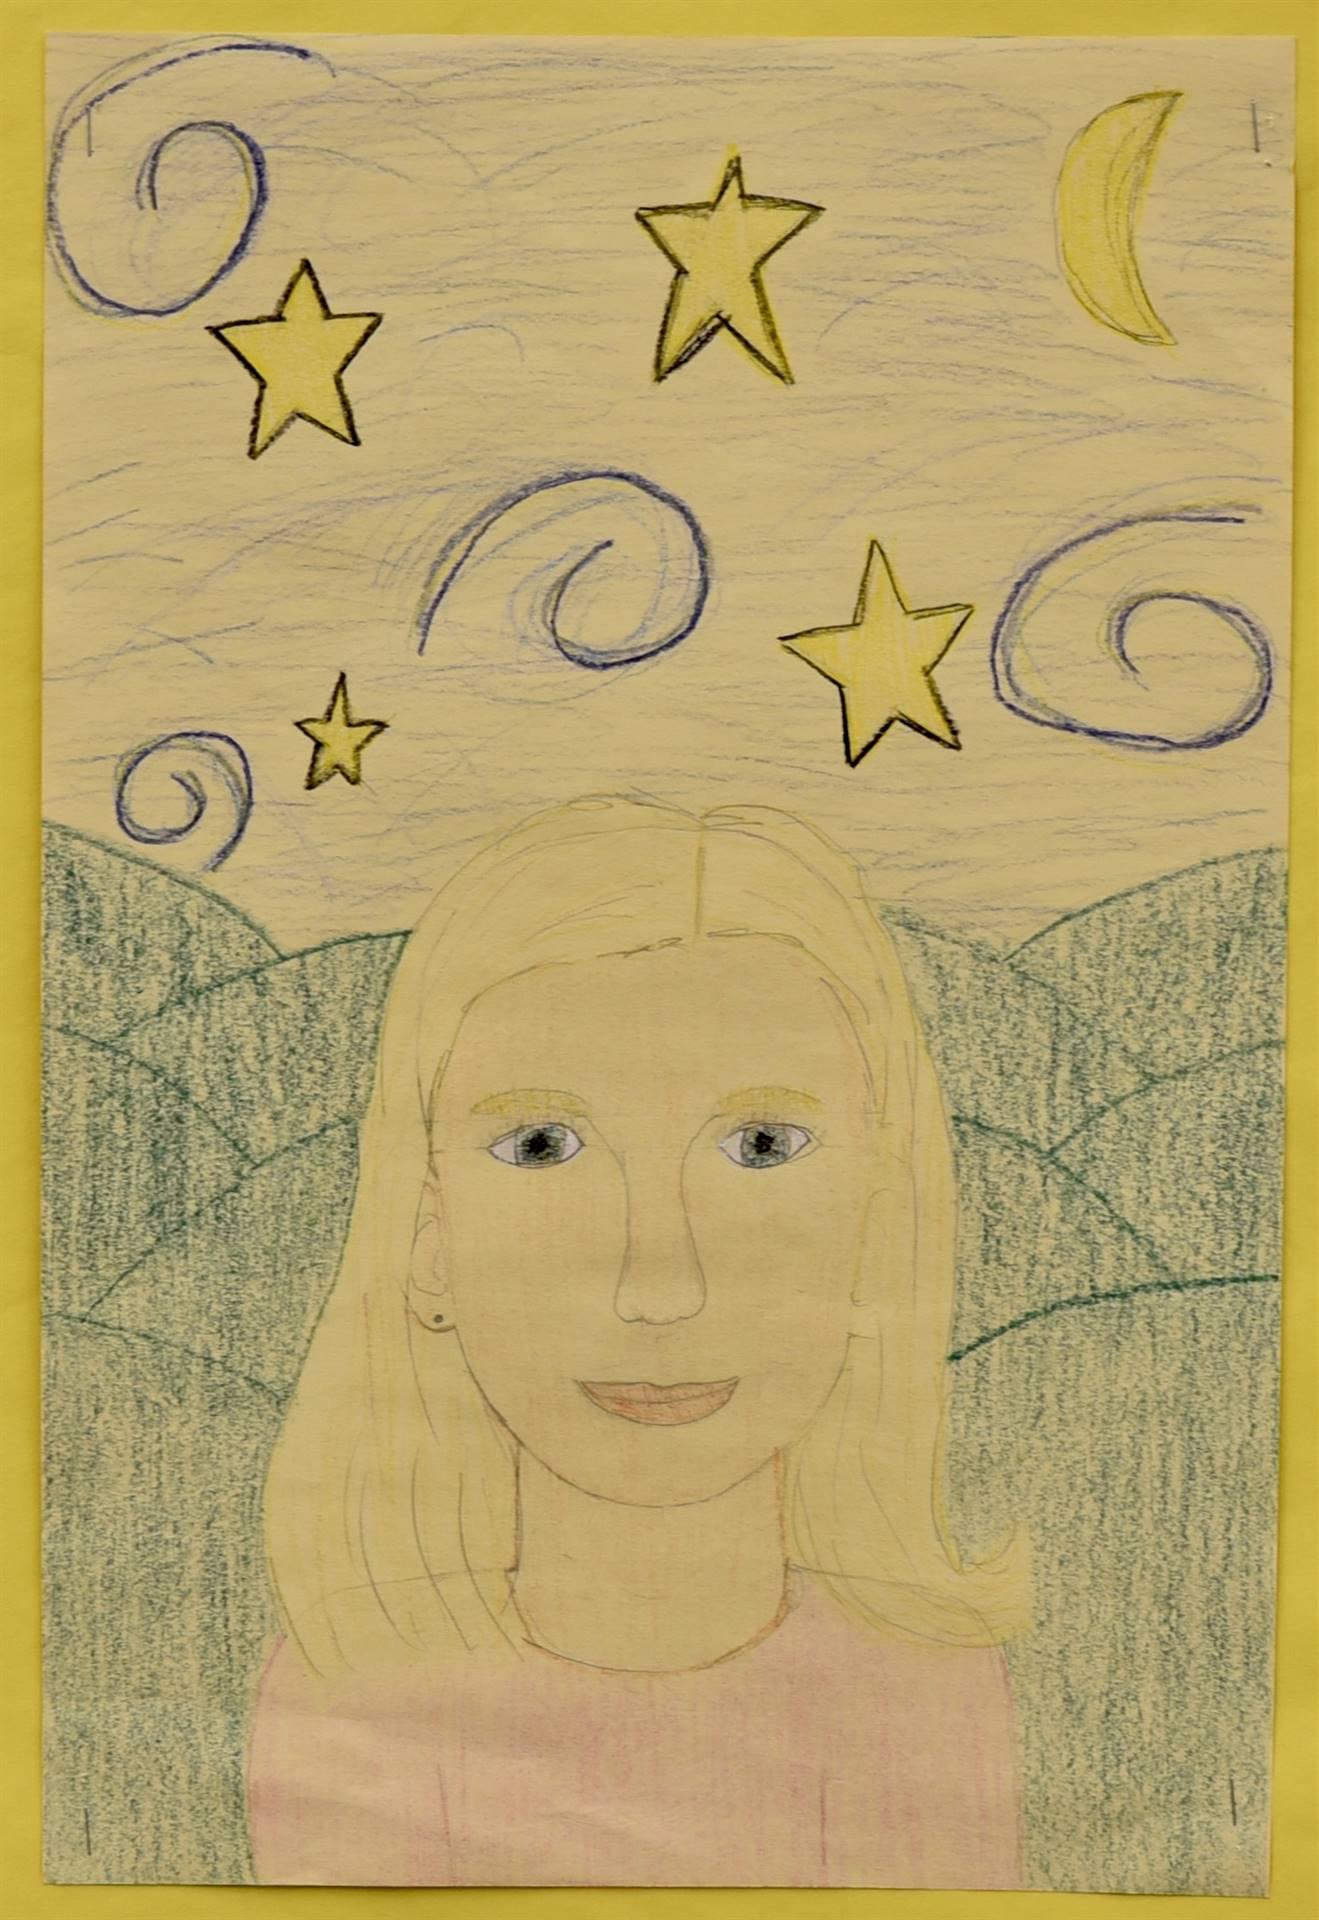 Brecksville-Broadview Hts. Middle School Art Projects 192